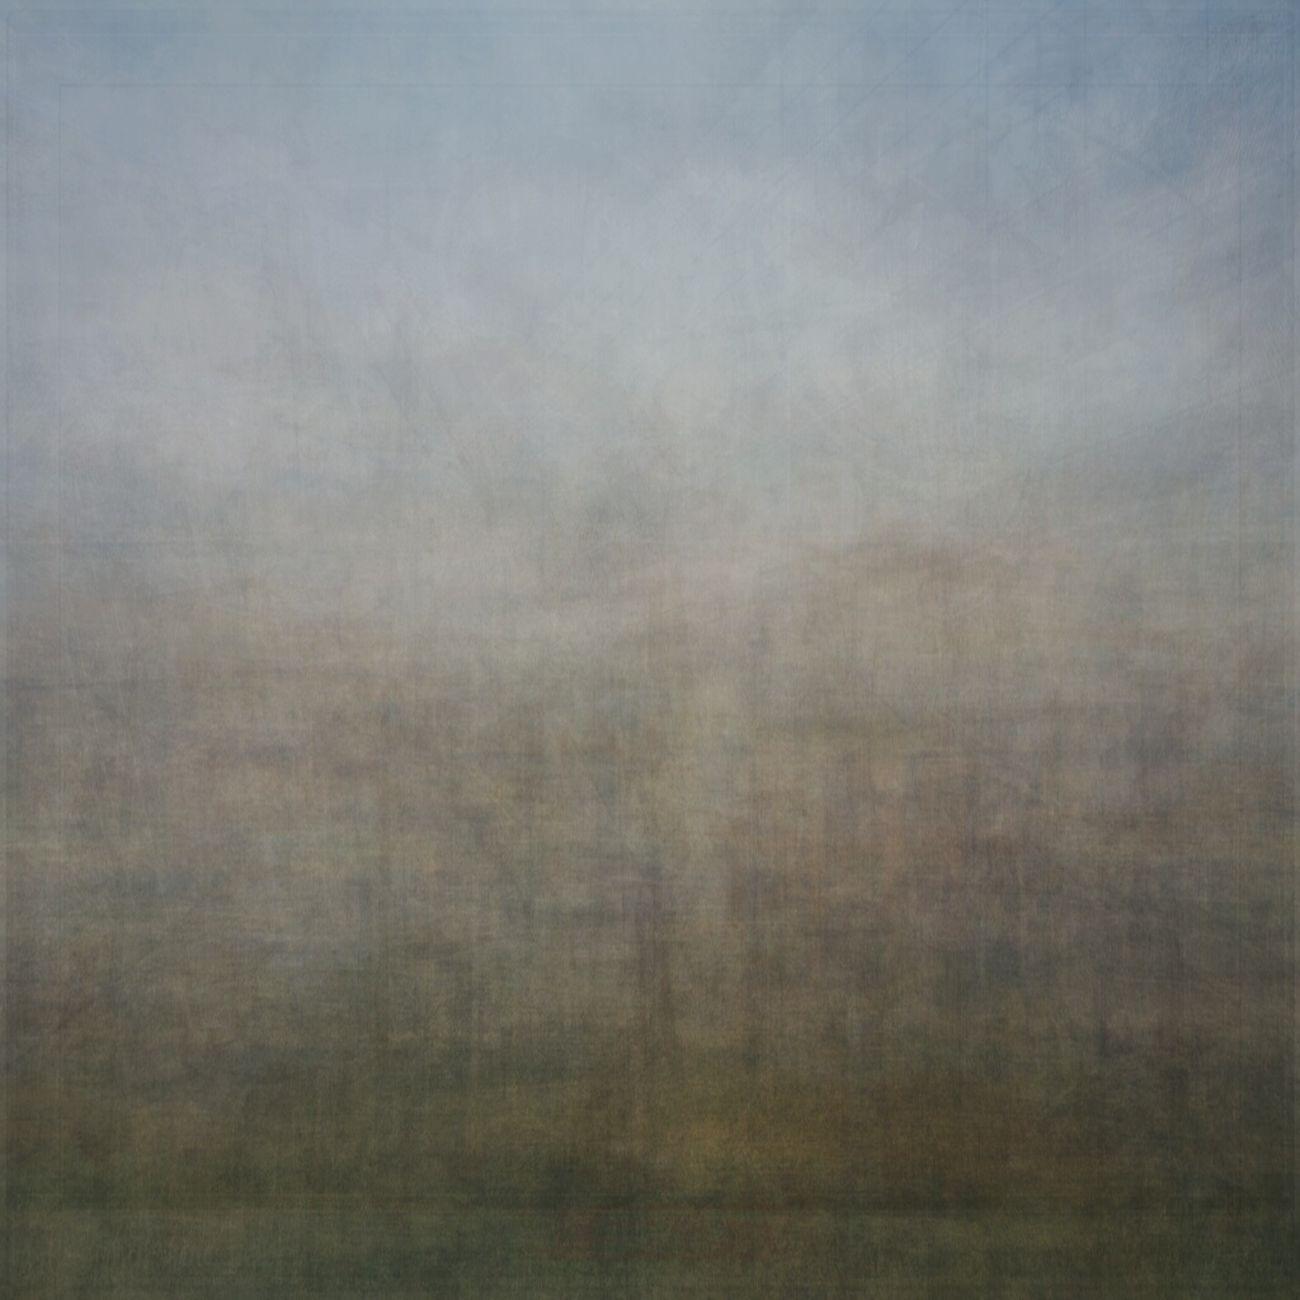 Photoecho 2 : Clouds